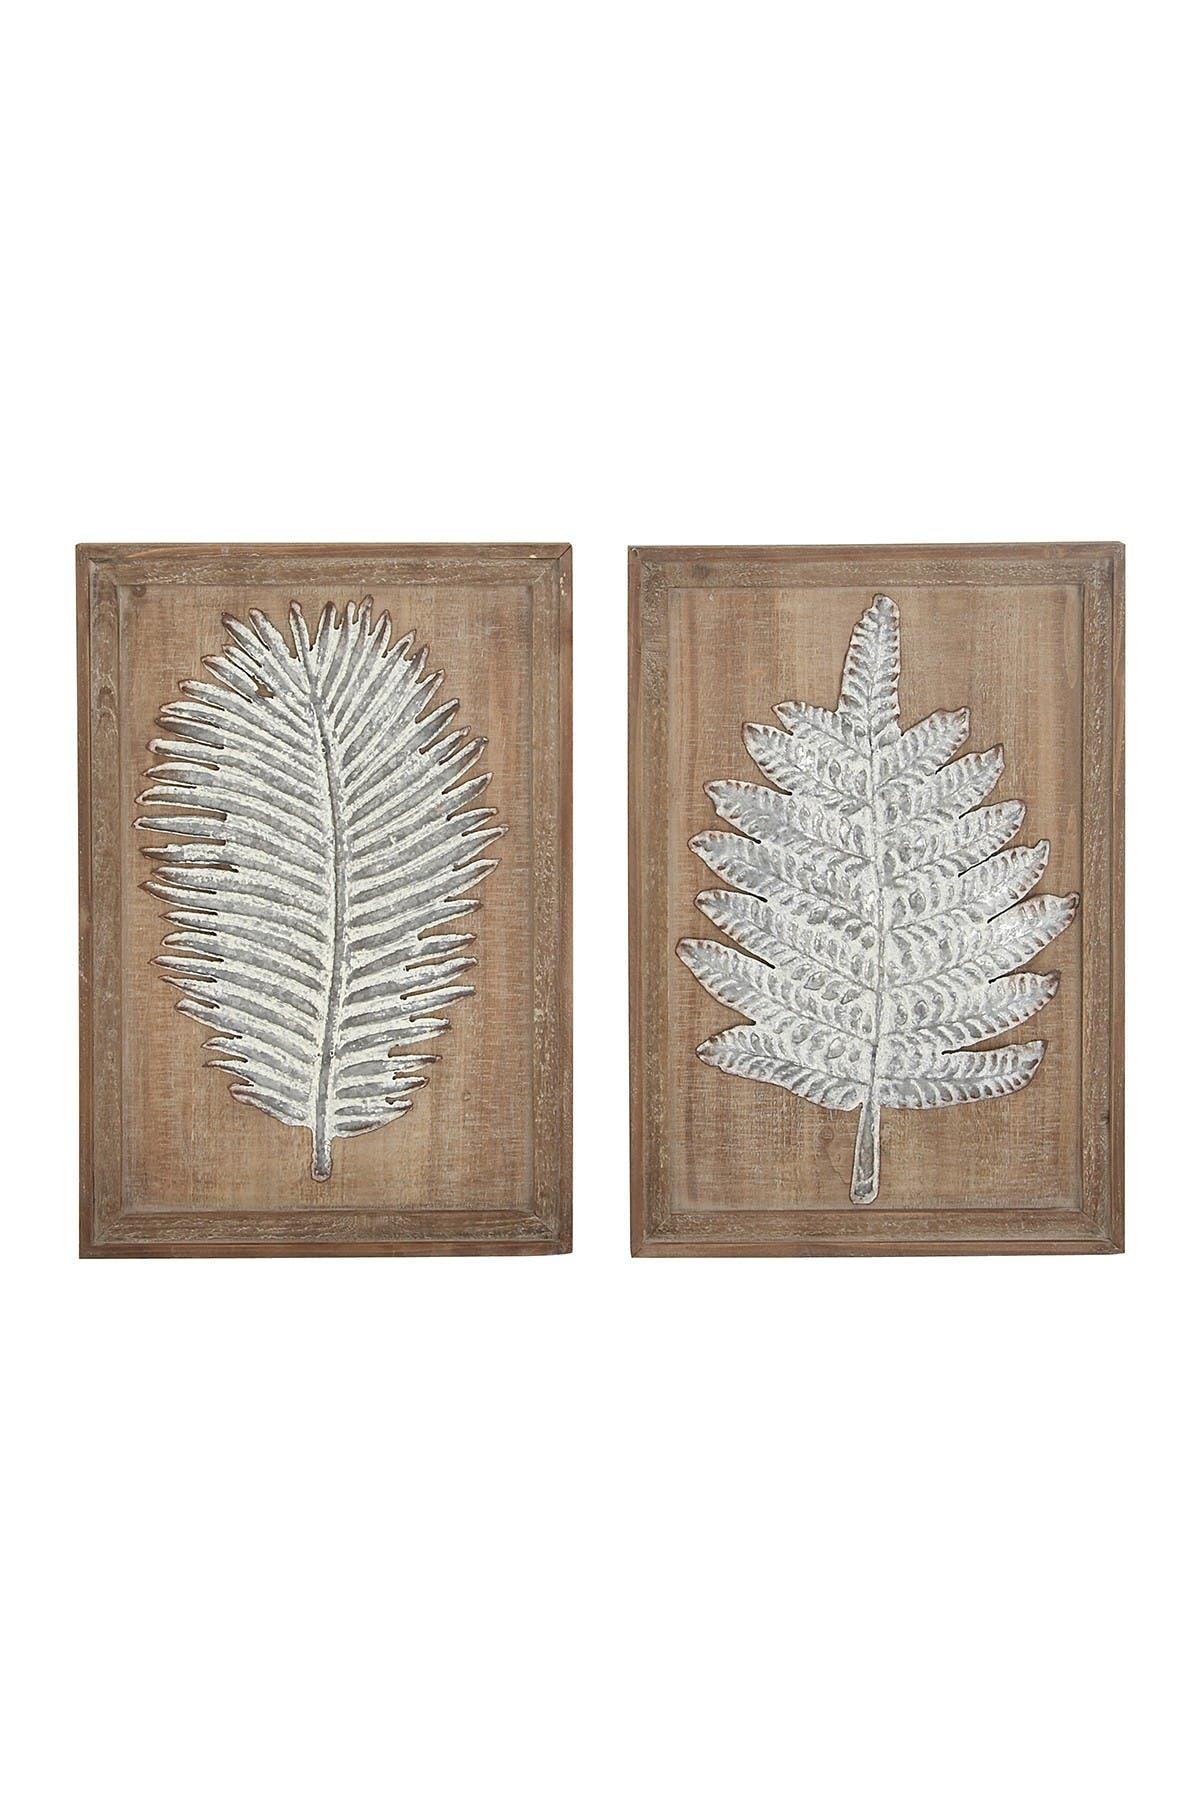 Image of Willow Row Rectangular Brown Wood and Metal Wall Panel - Set of 2